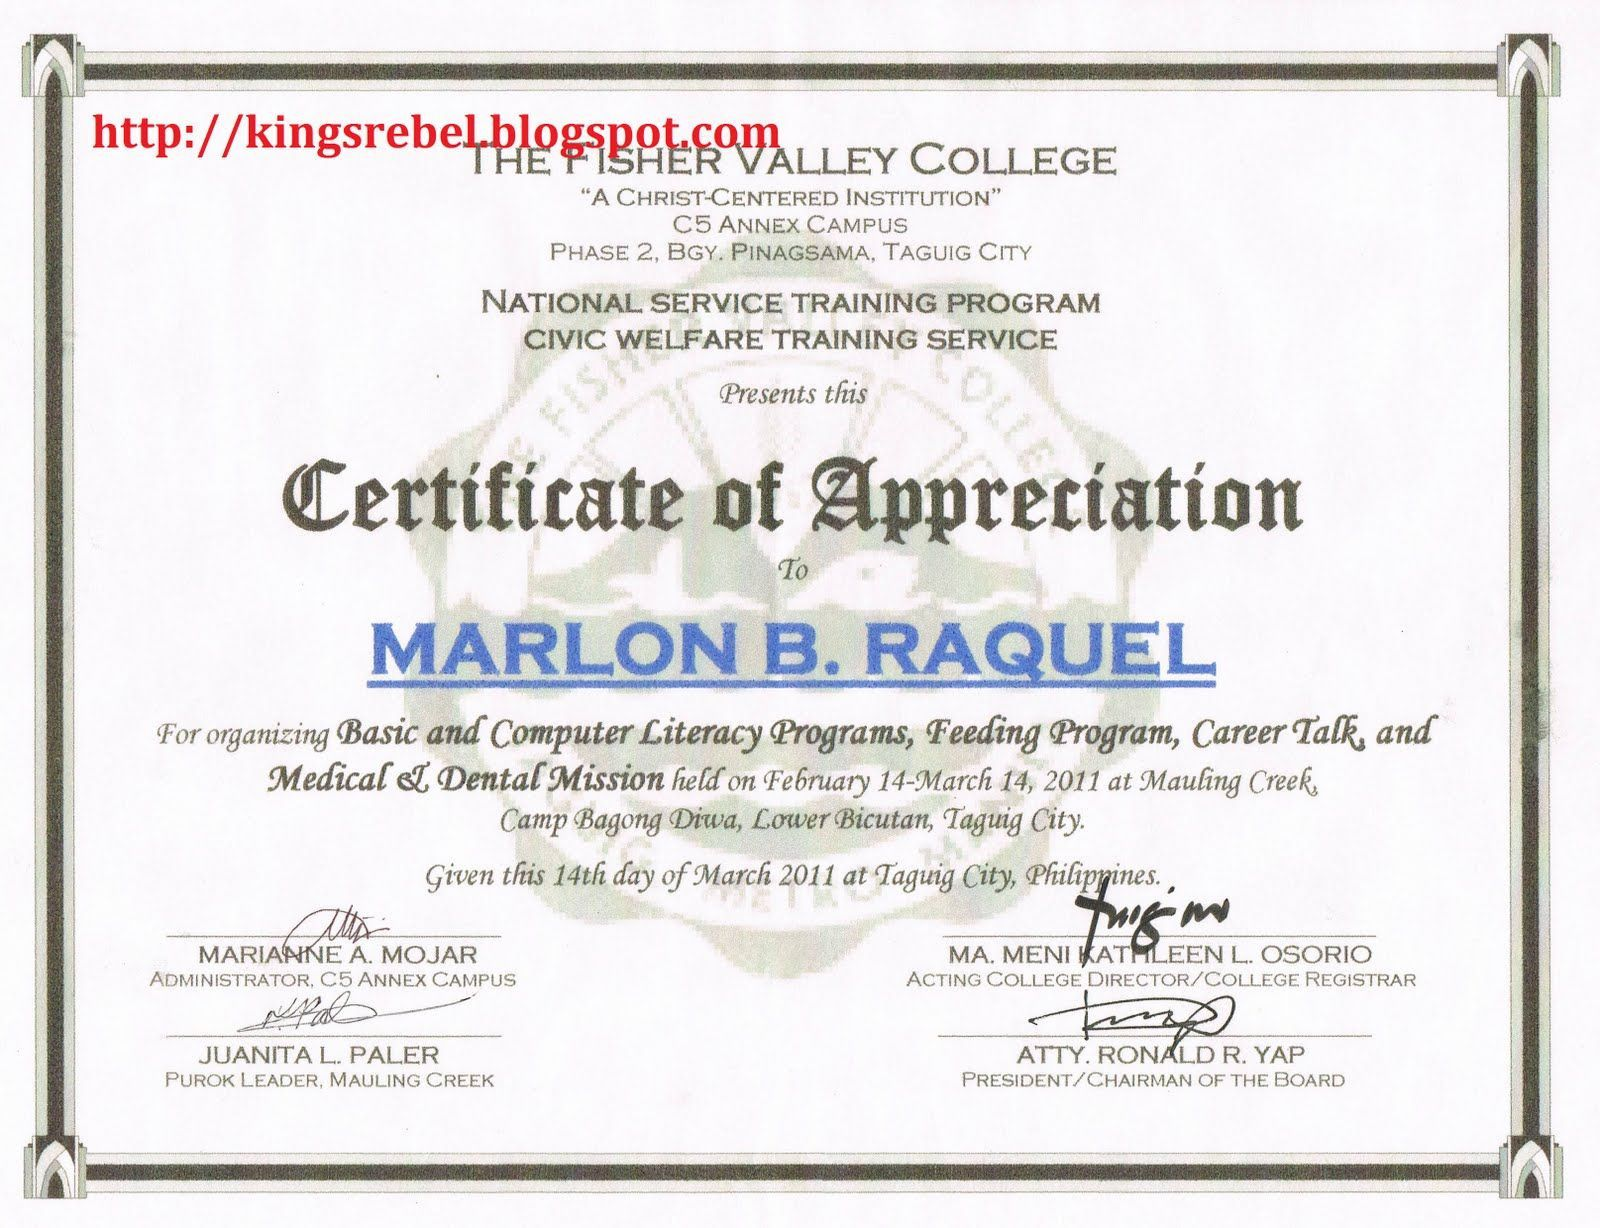 003 Stunning Certificate Of Recognition Sample Wording Image  AwardFull